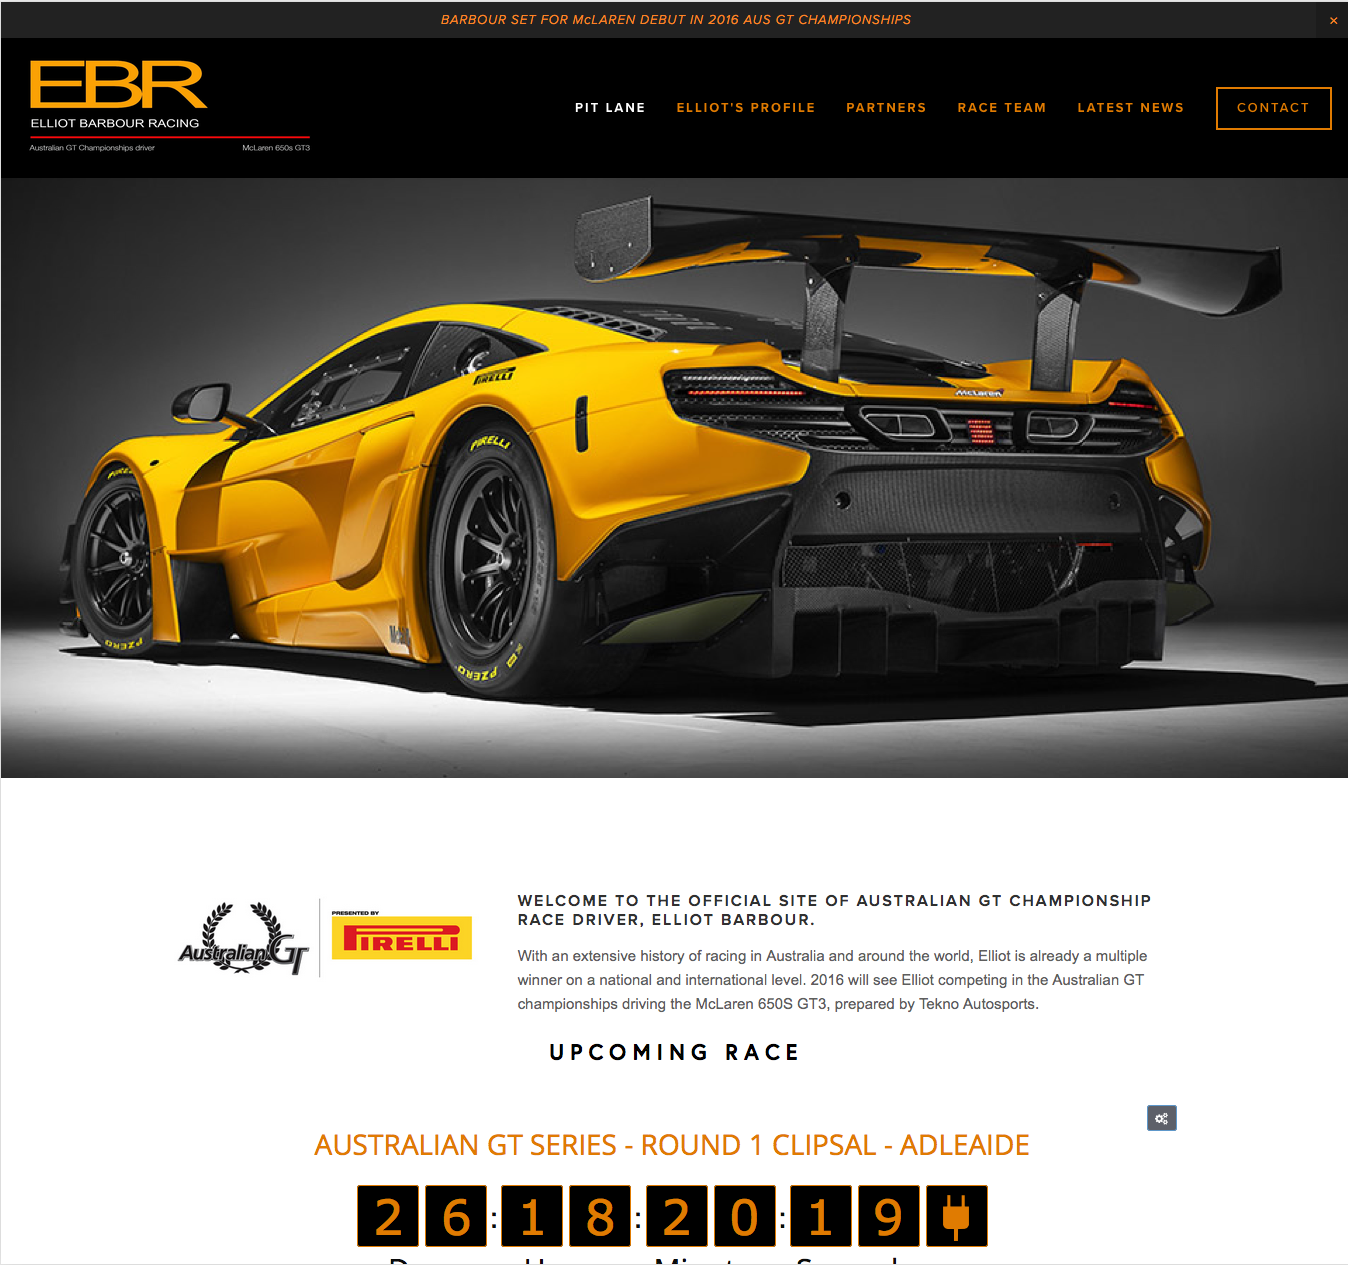 website of Australian GT McLaren driver ELLIOT BARBOUR is designed, installed and updated by PLM